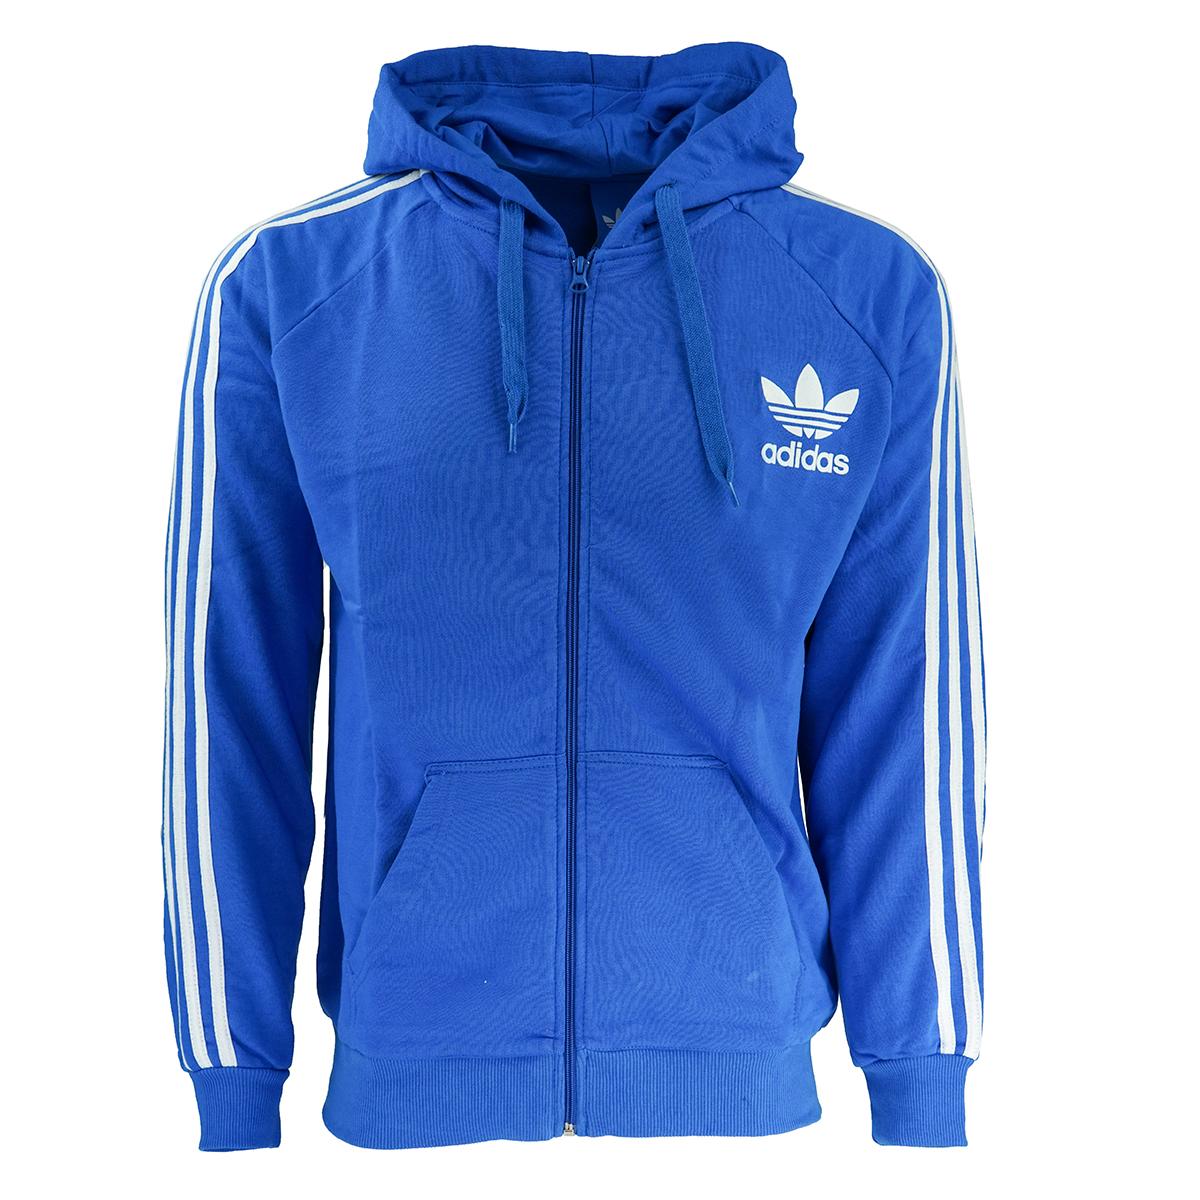 adidas Men s Originals Trefoil Zip Hoodie Royal Blue S 4056565735235 ... 7941bebf3